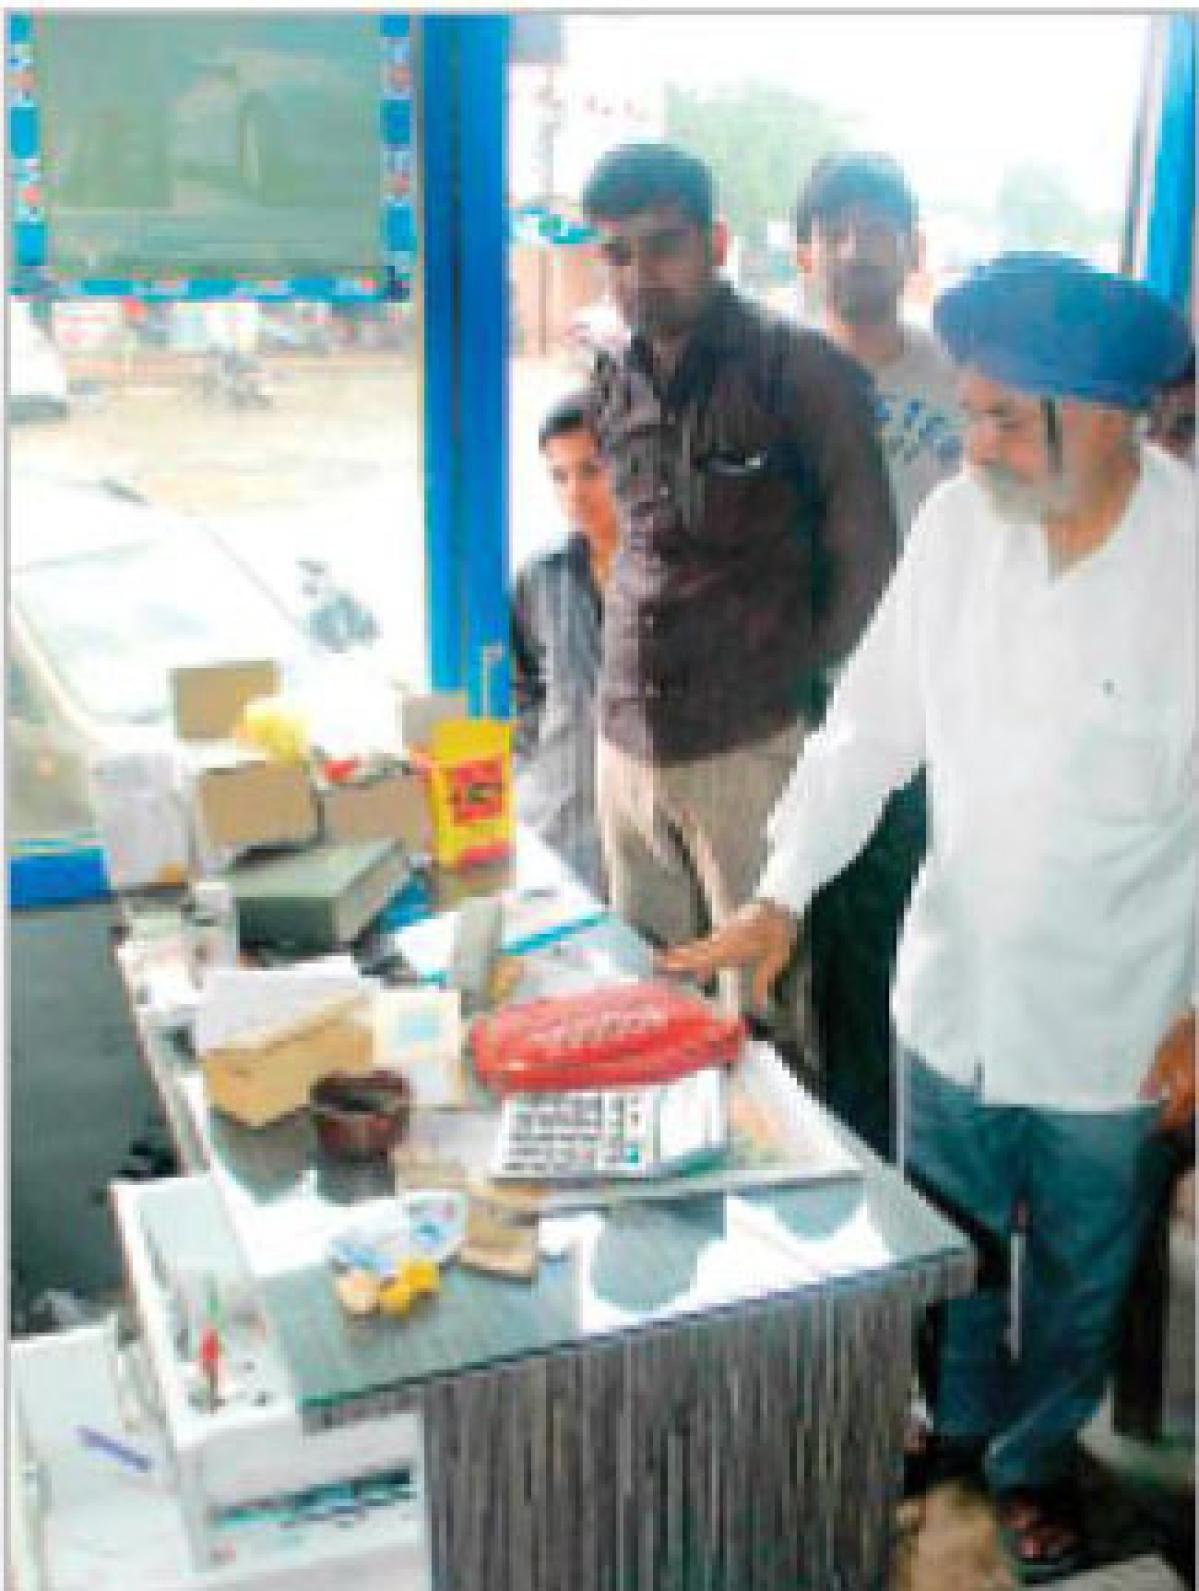 3 shops burgled, goods worth thousands stolen